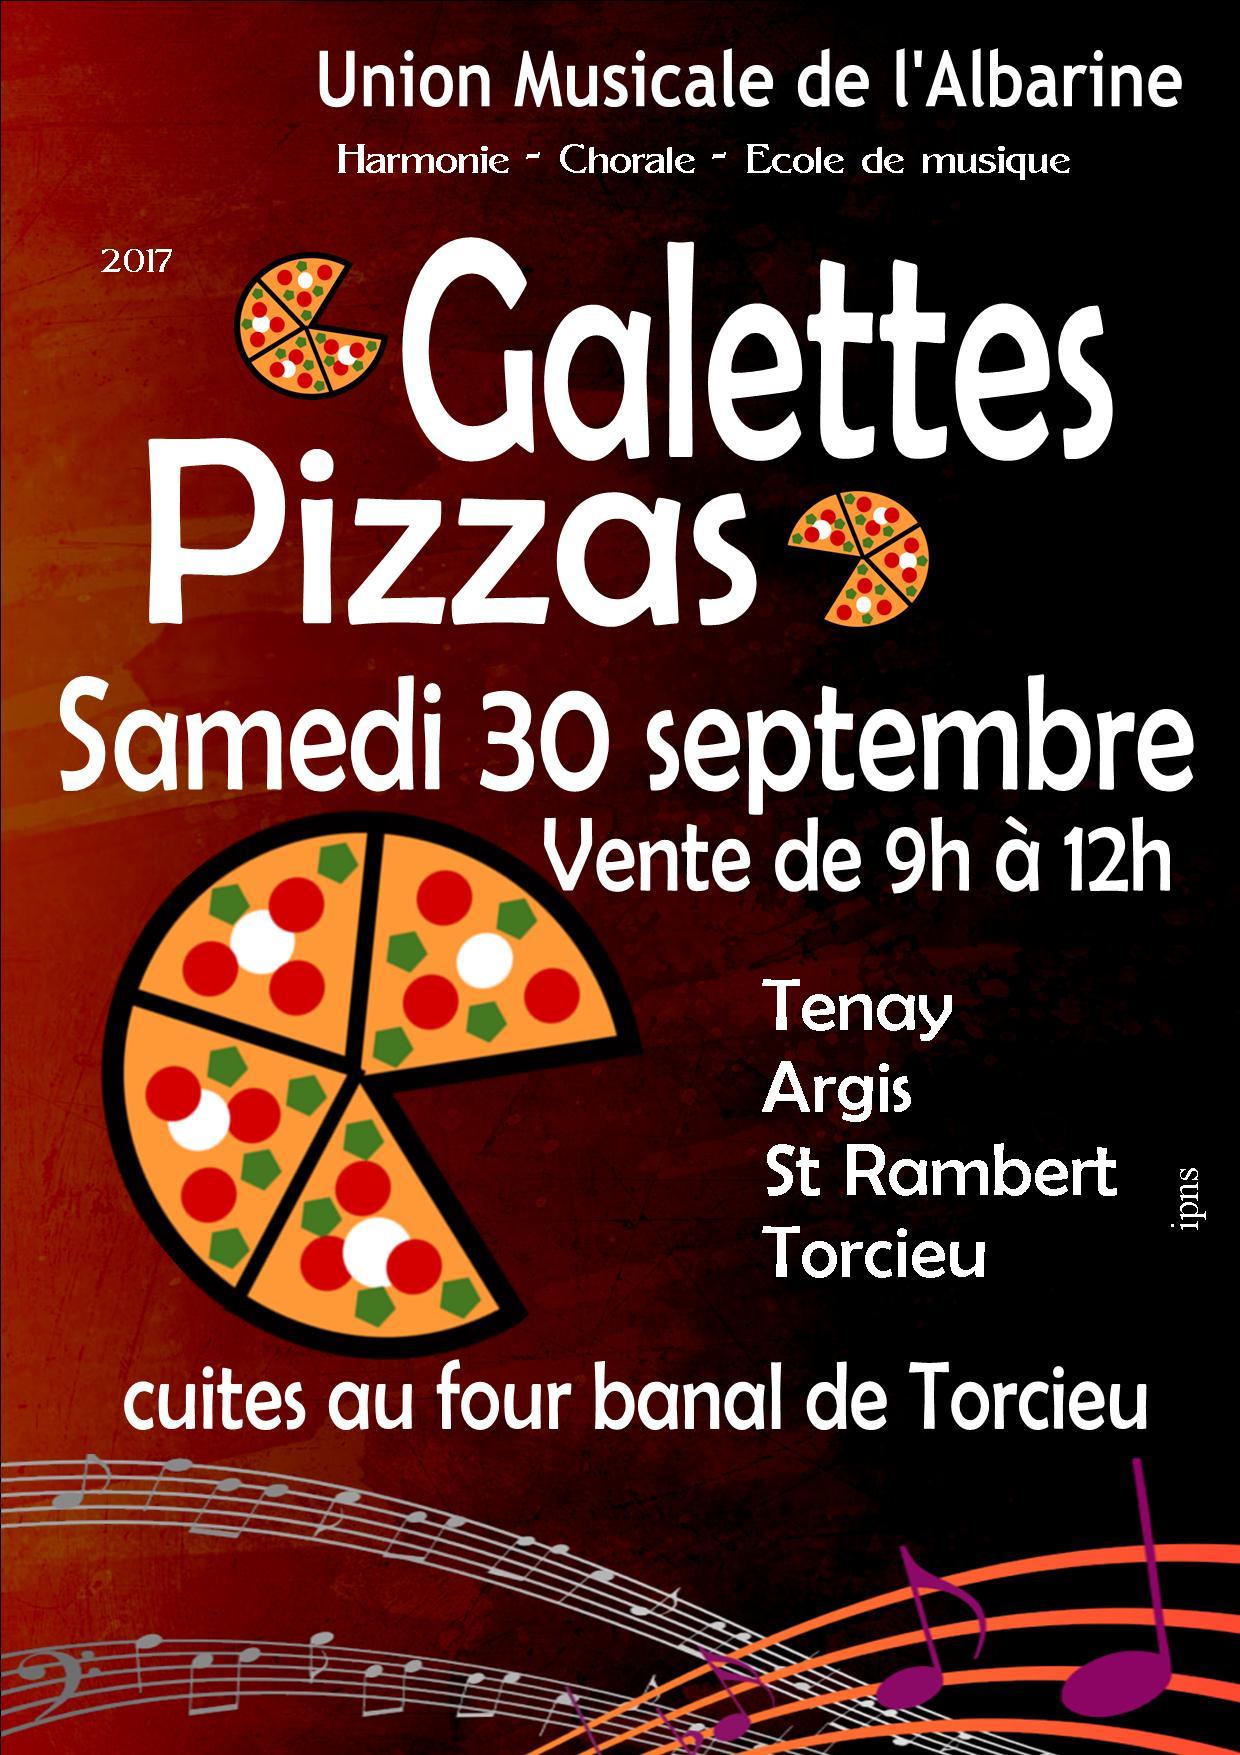 Galettes et Pizzas 2017 Union Musicale Albarine